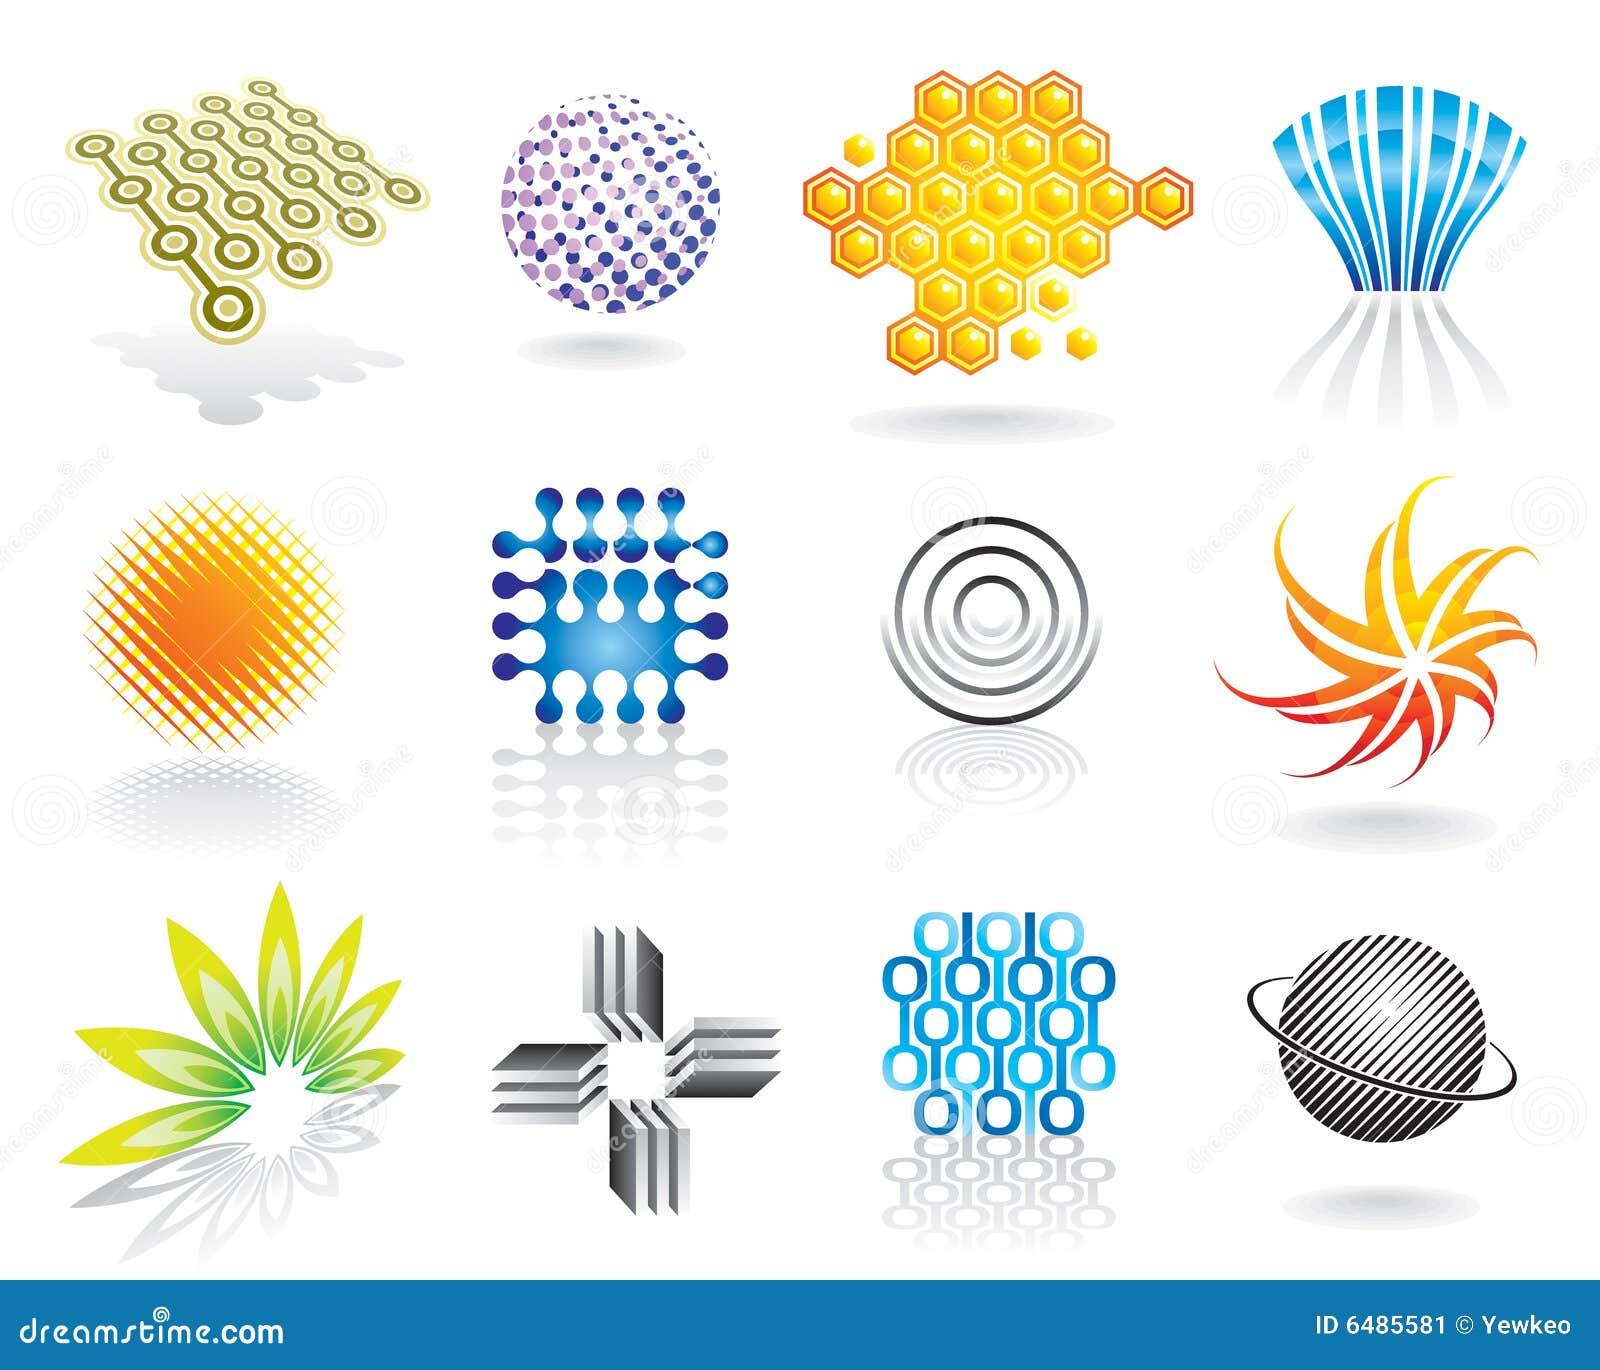 Gráfico Symbol_02